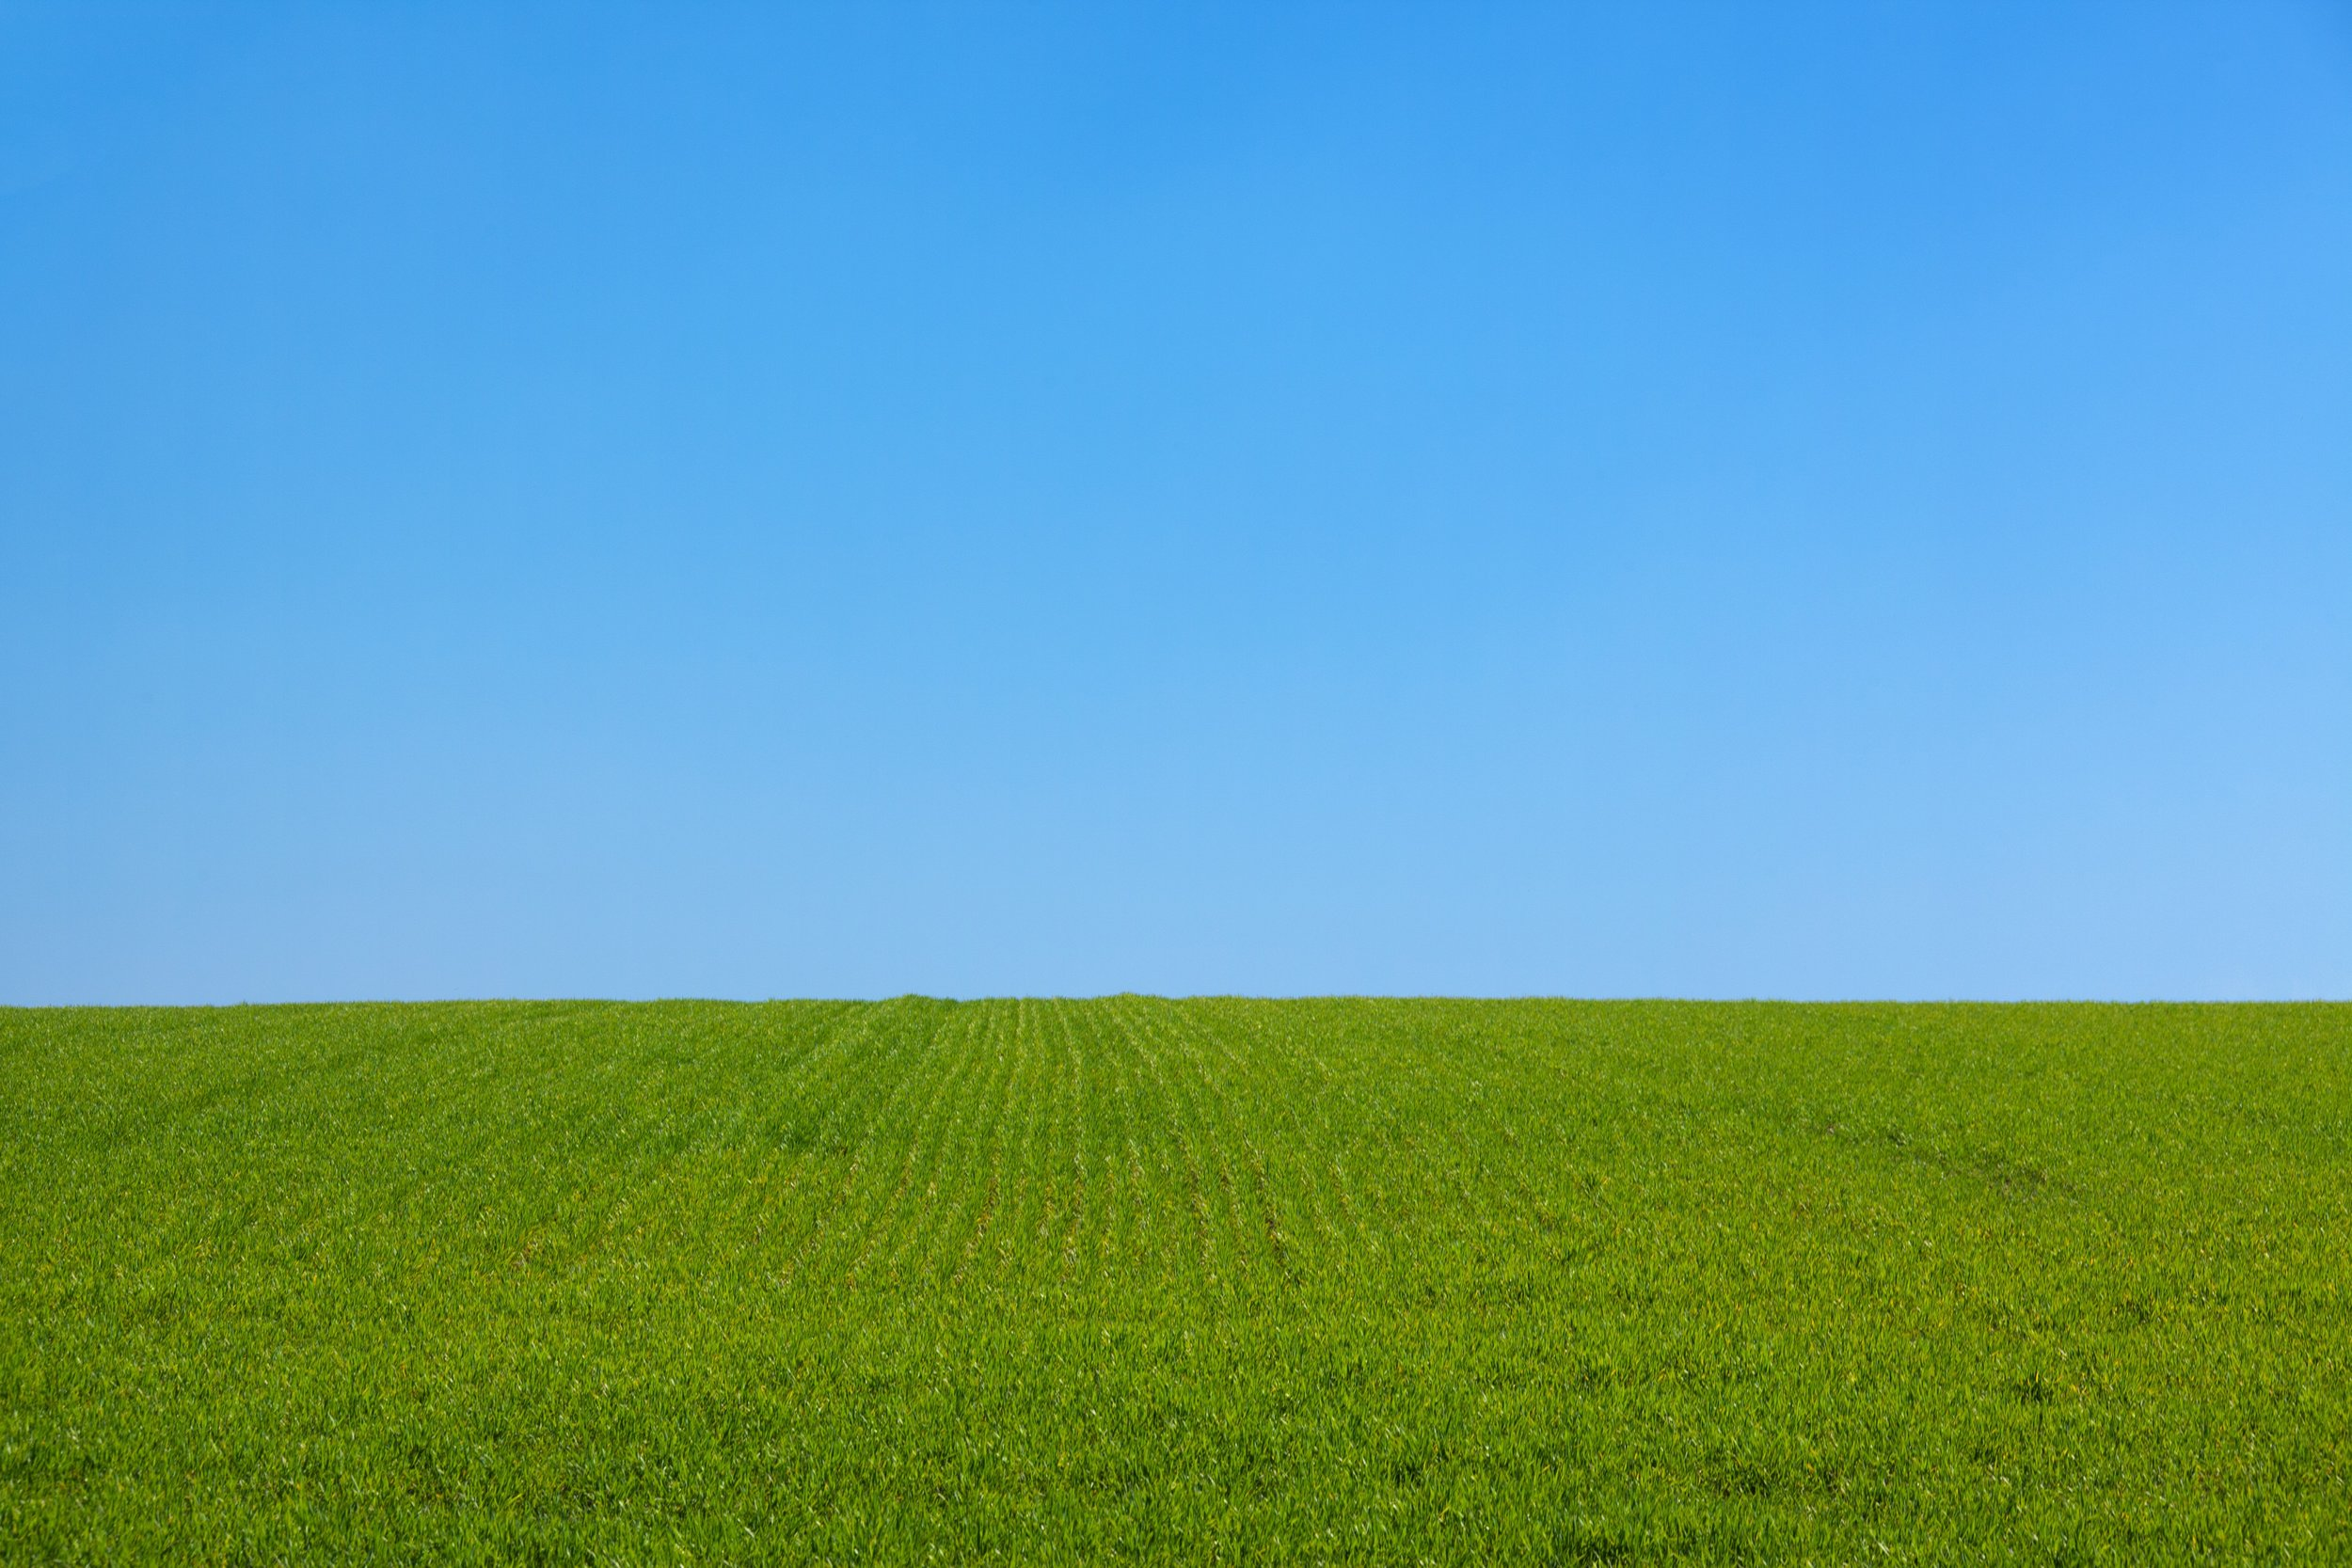 landscape-nature-grass-outdoor-horizon-plant-1153308-pxhere.com.jpg